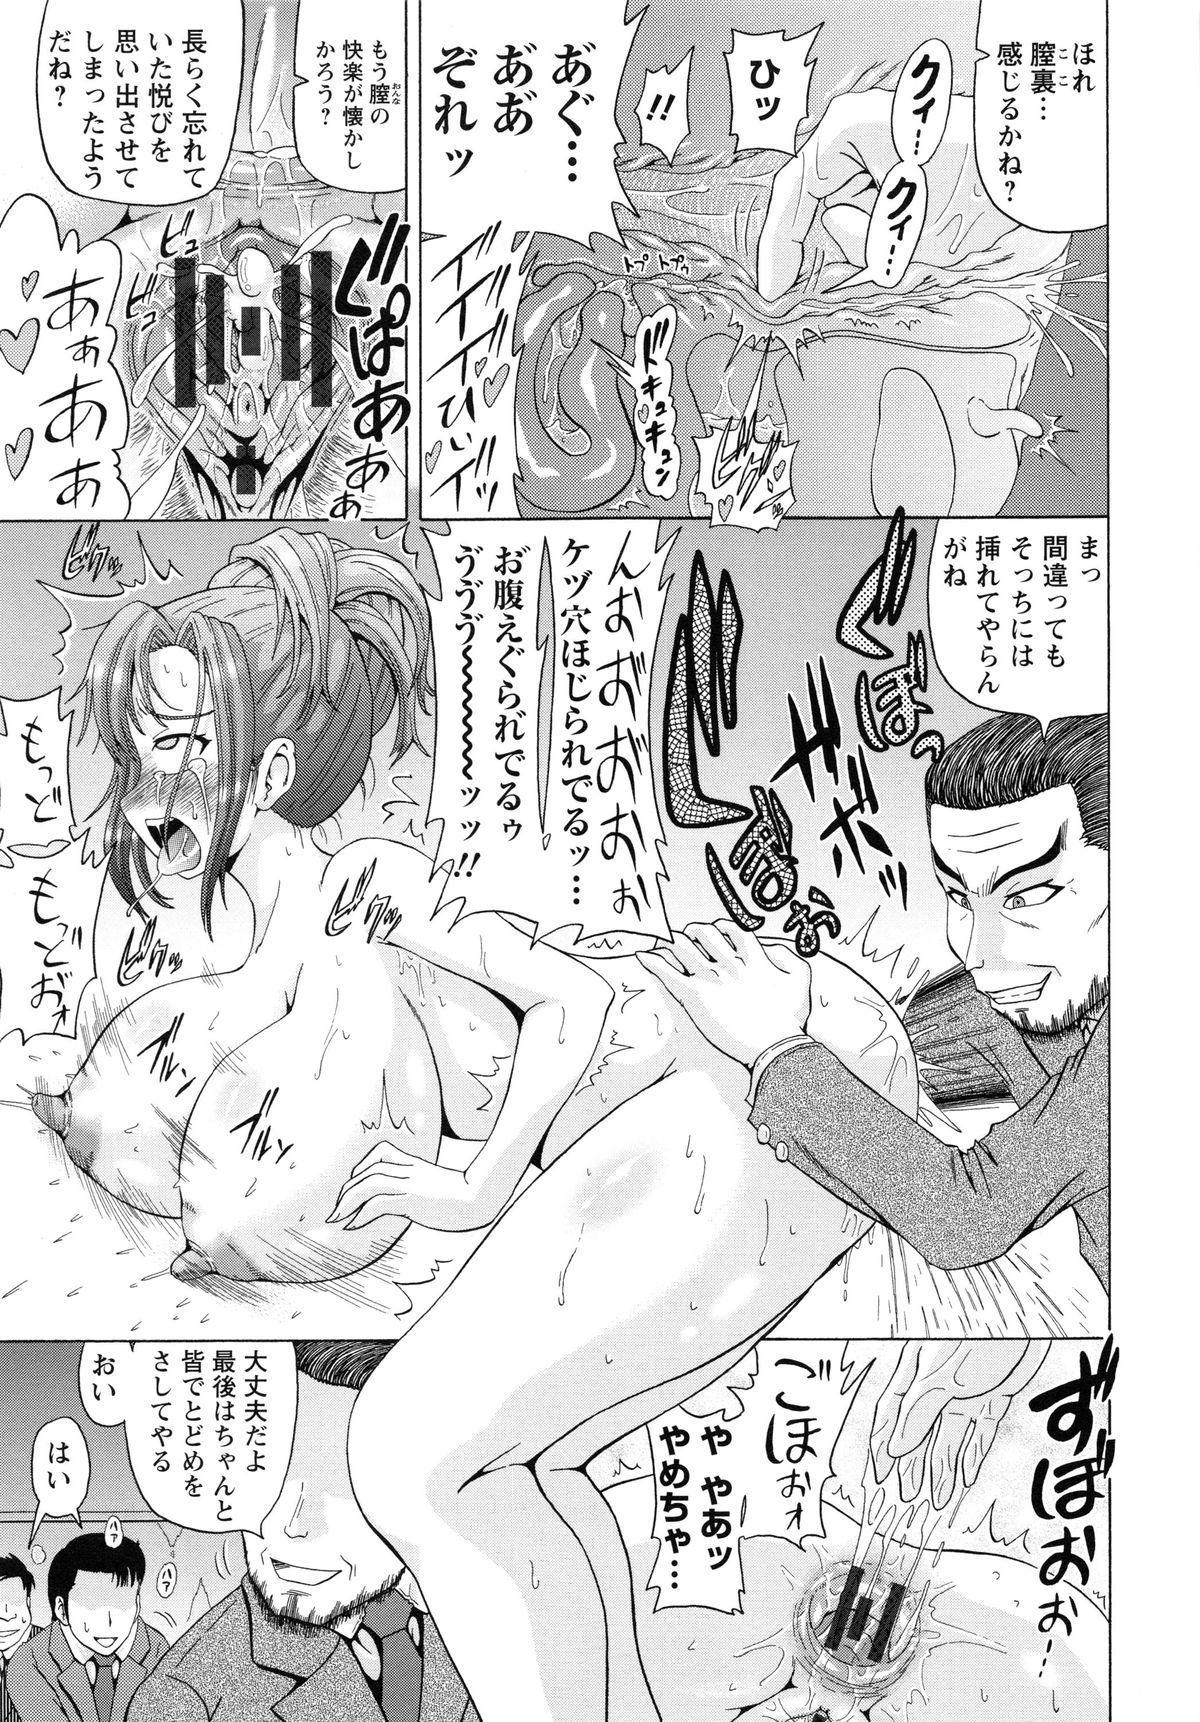 [Nukunuku Orange] Seikou ~Maeana Kanzen Houchi~ - Keep Anus in Anguish!!!! 170